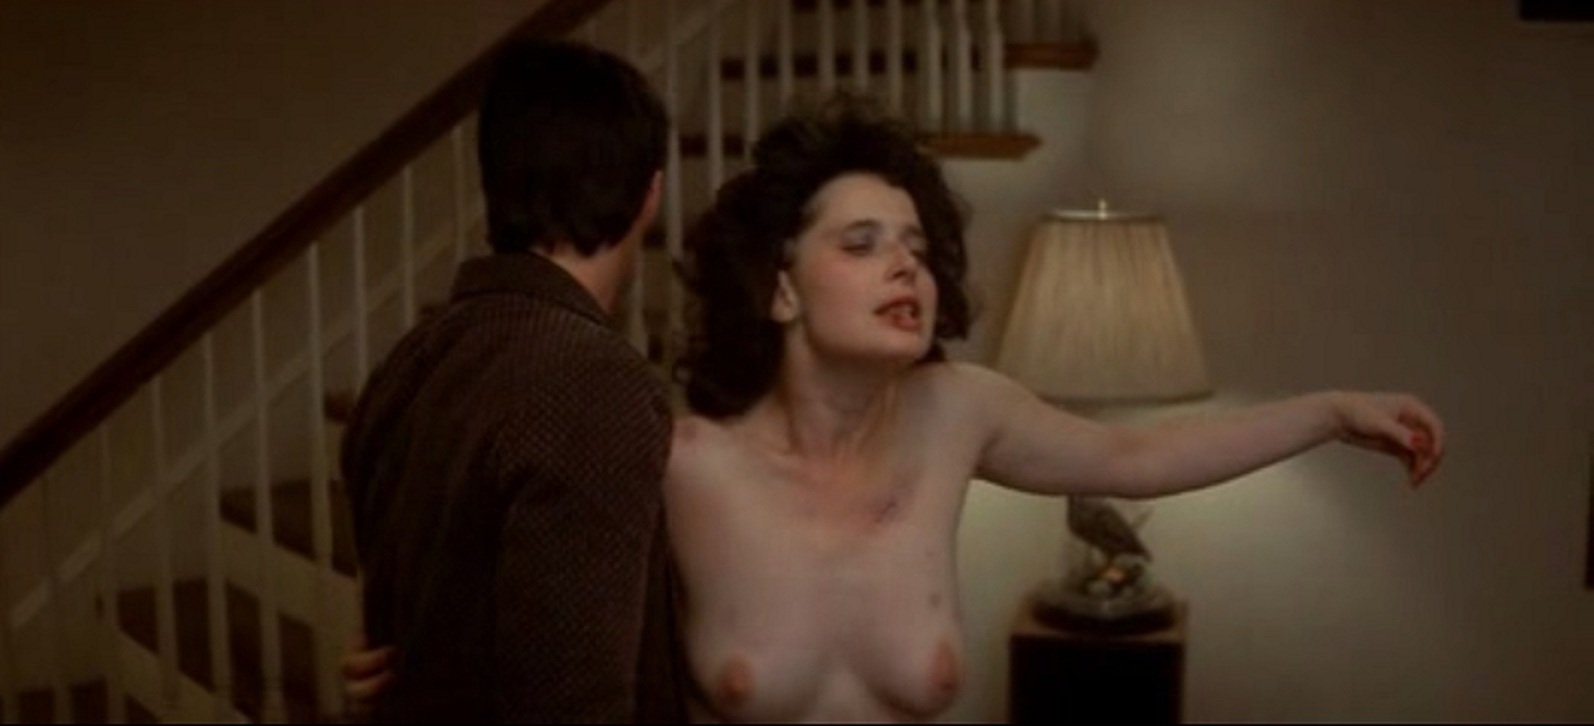 Laura harrington nude